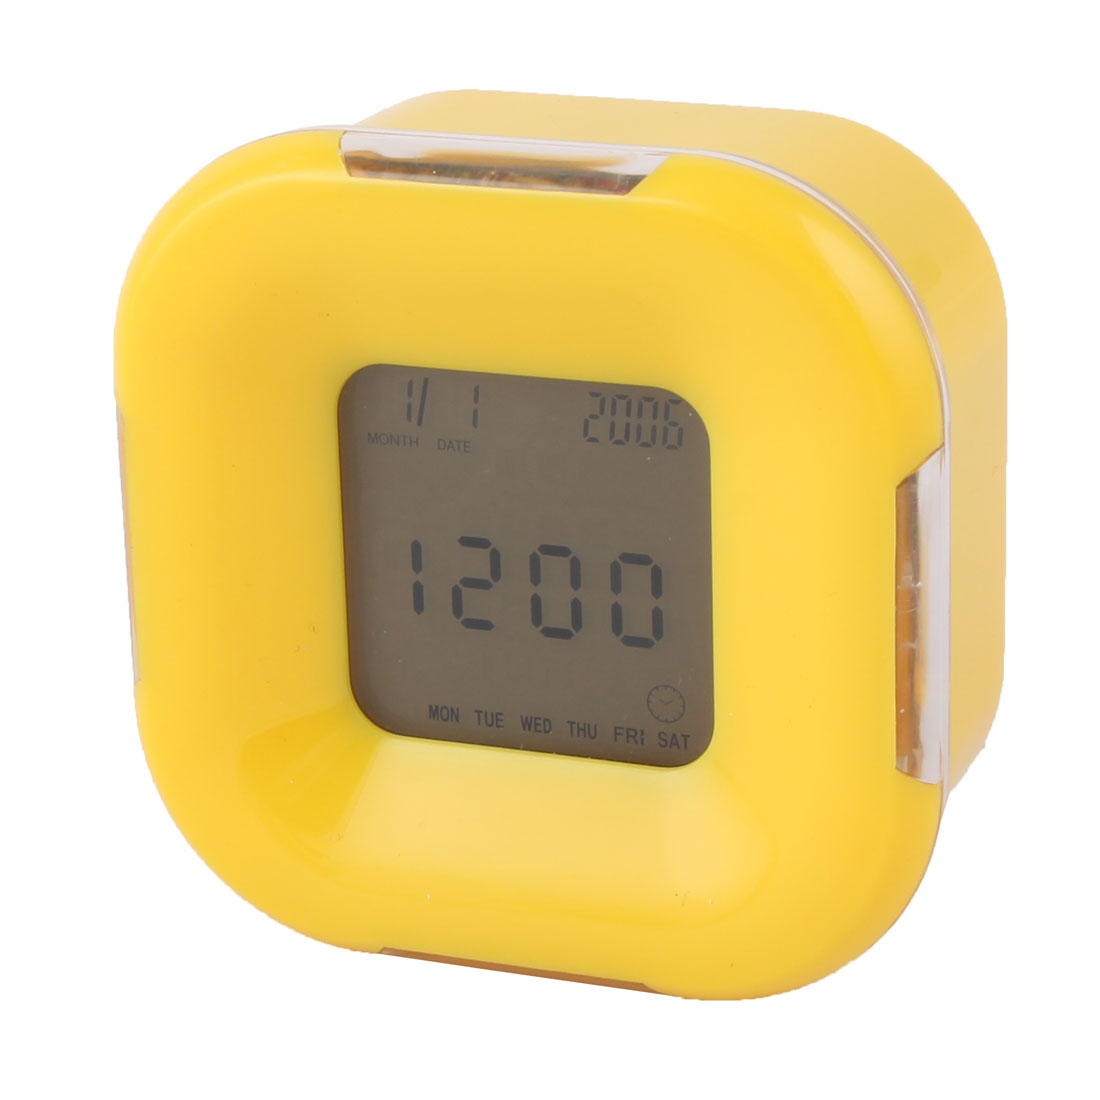 Pop Art Digital Square Clock - Yellow